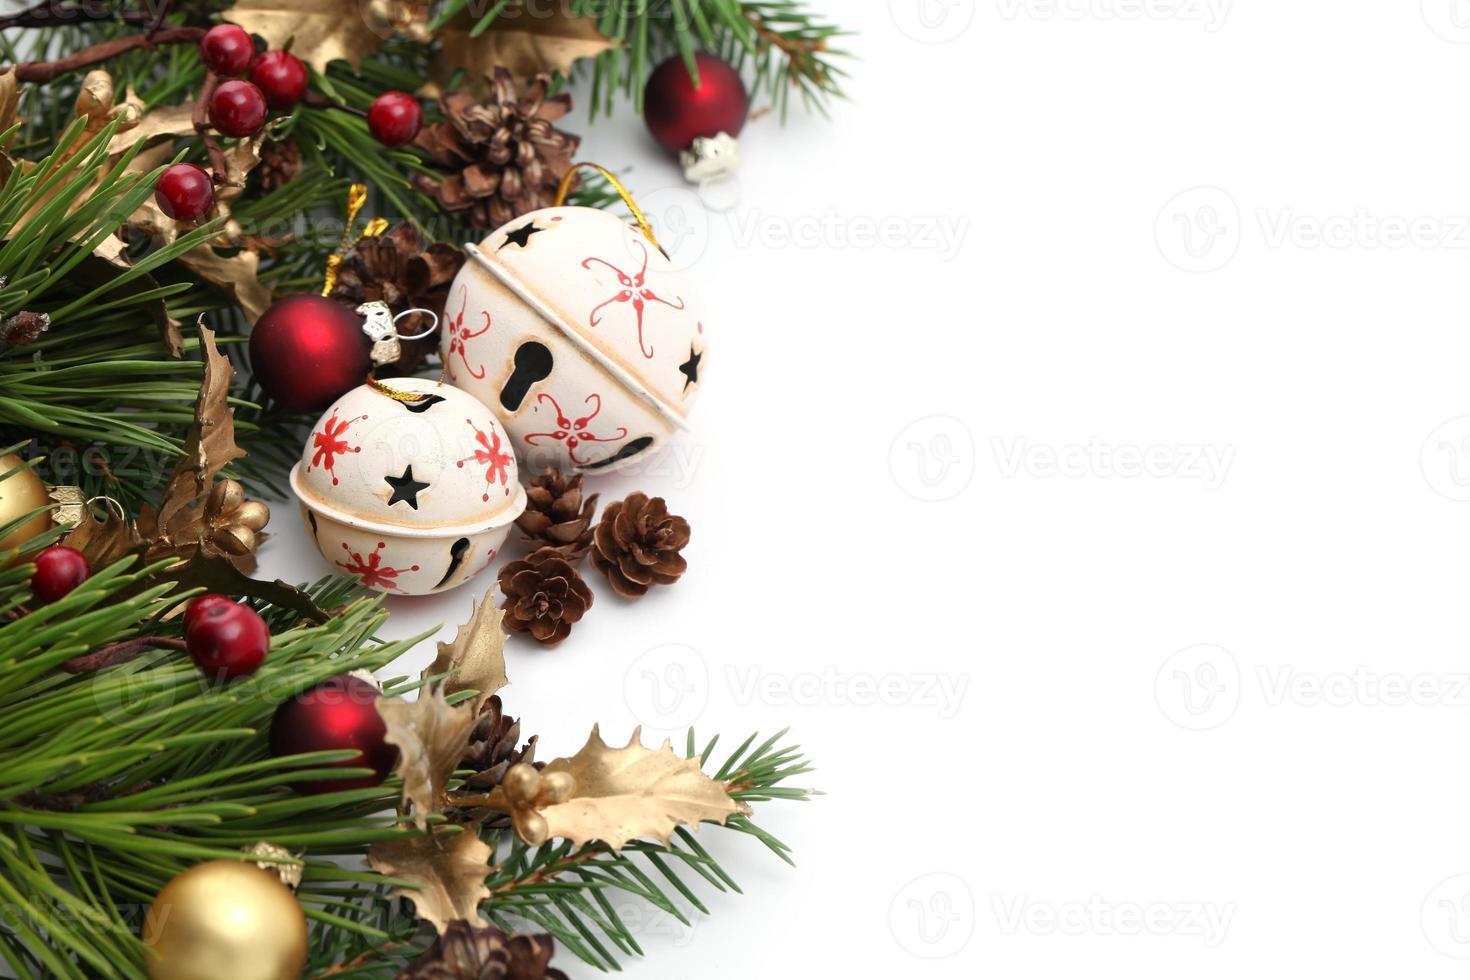 jingle bell navidad frontera foto